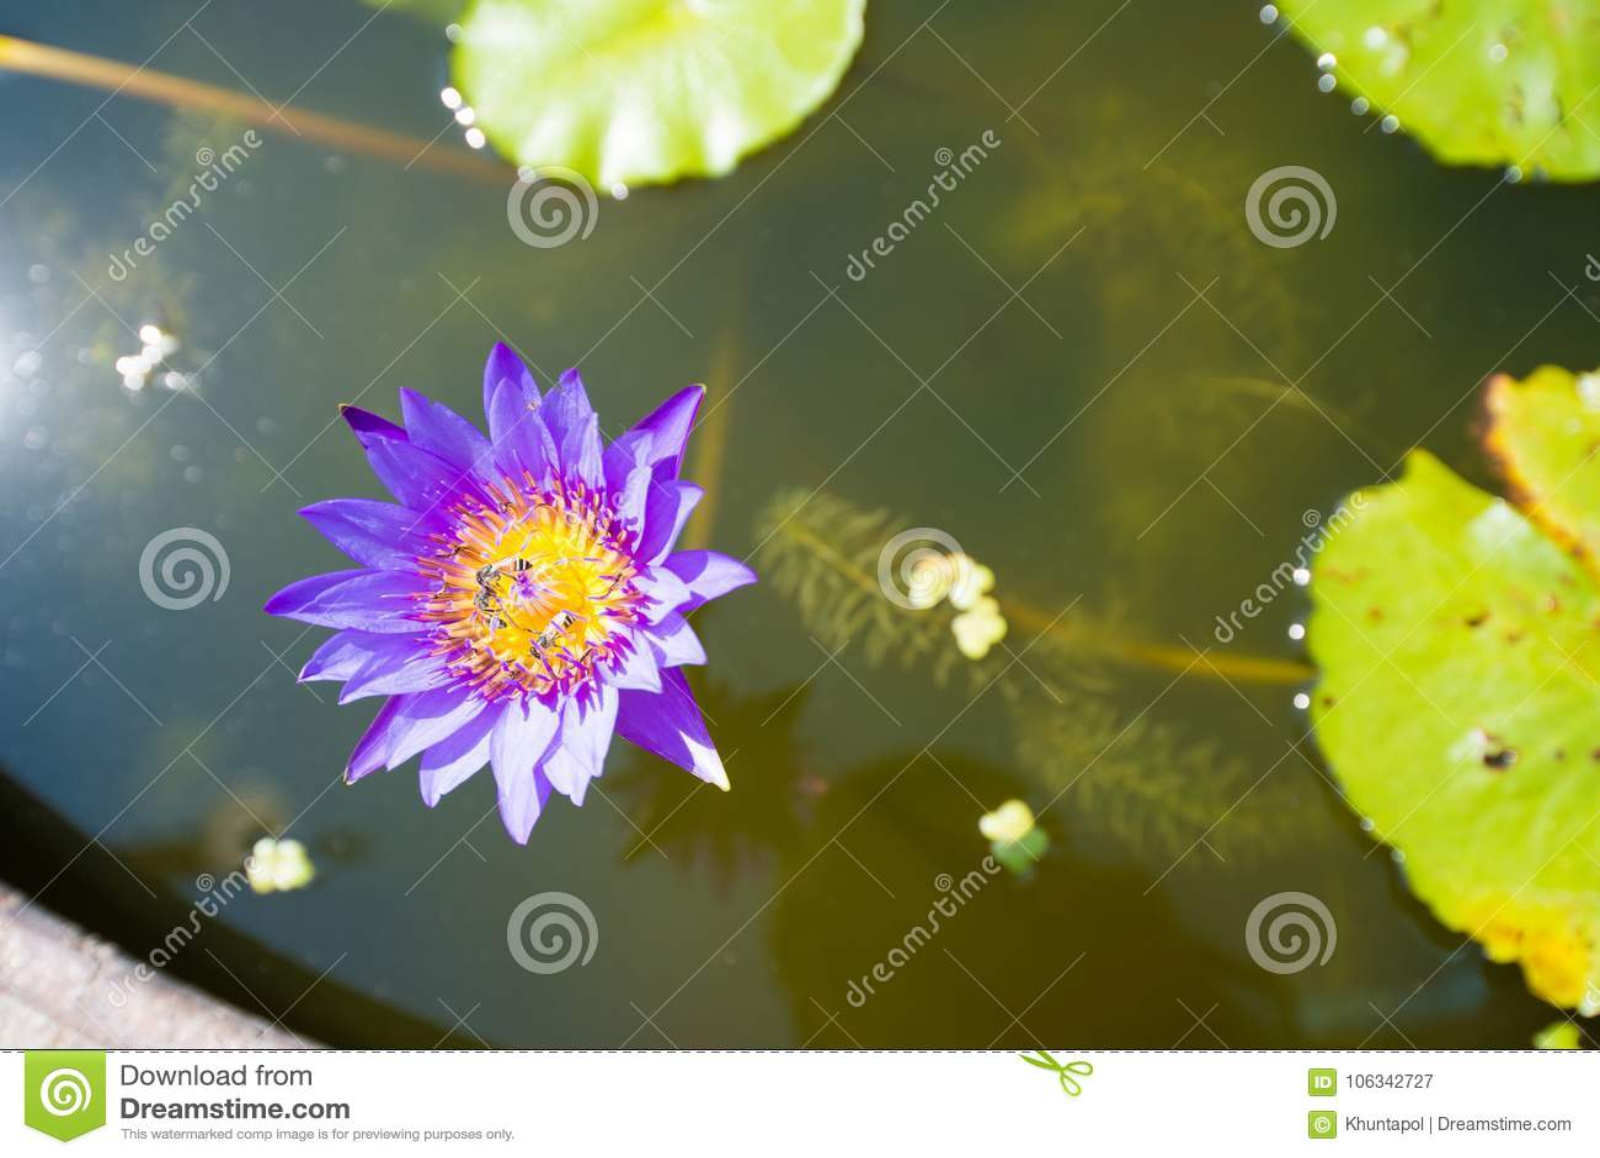 Closed Up Purple Lotus Flower Stock Image Image Of Bloom